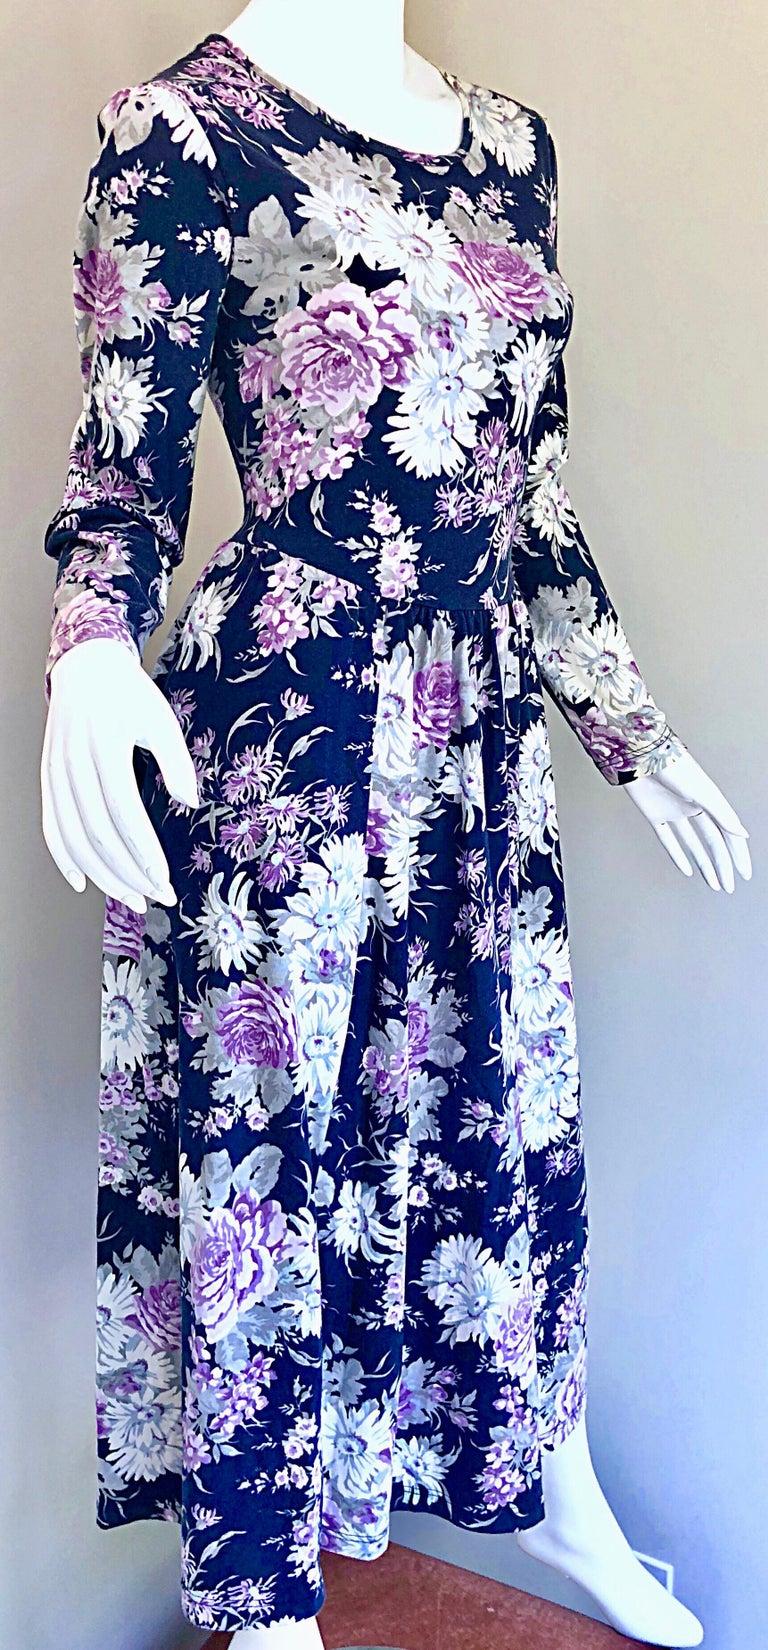 1990s Laura Ashley Navy Blue + Purple Long Sleeve Cotton Vintage 90s Midi Dress For Sale 1